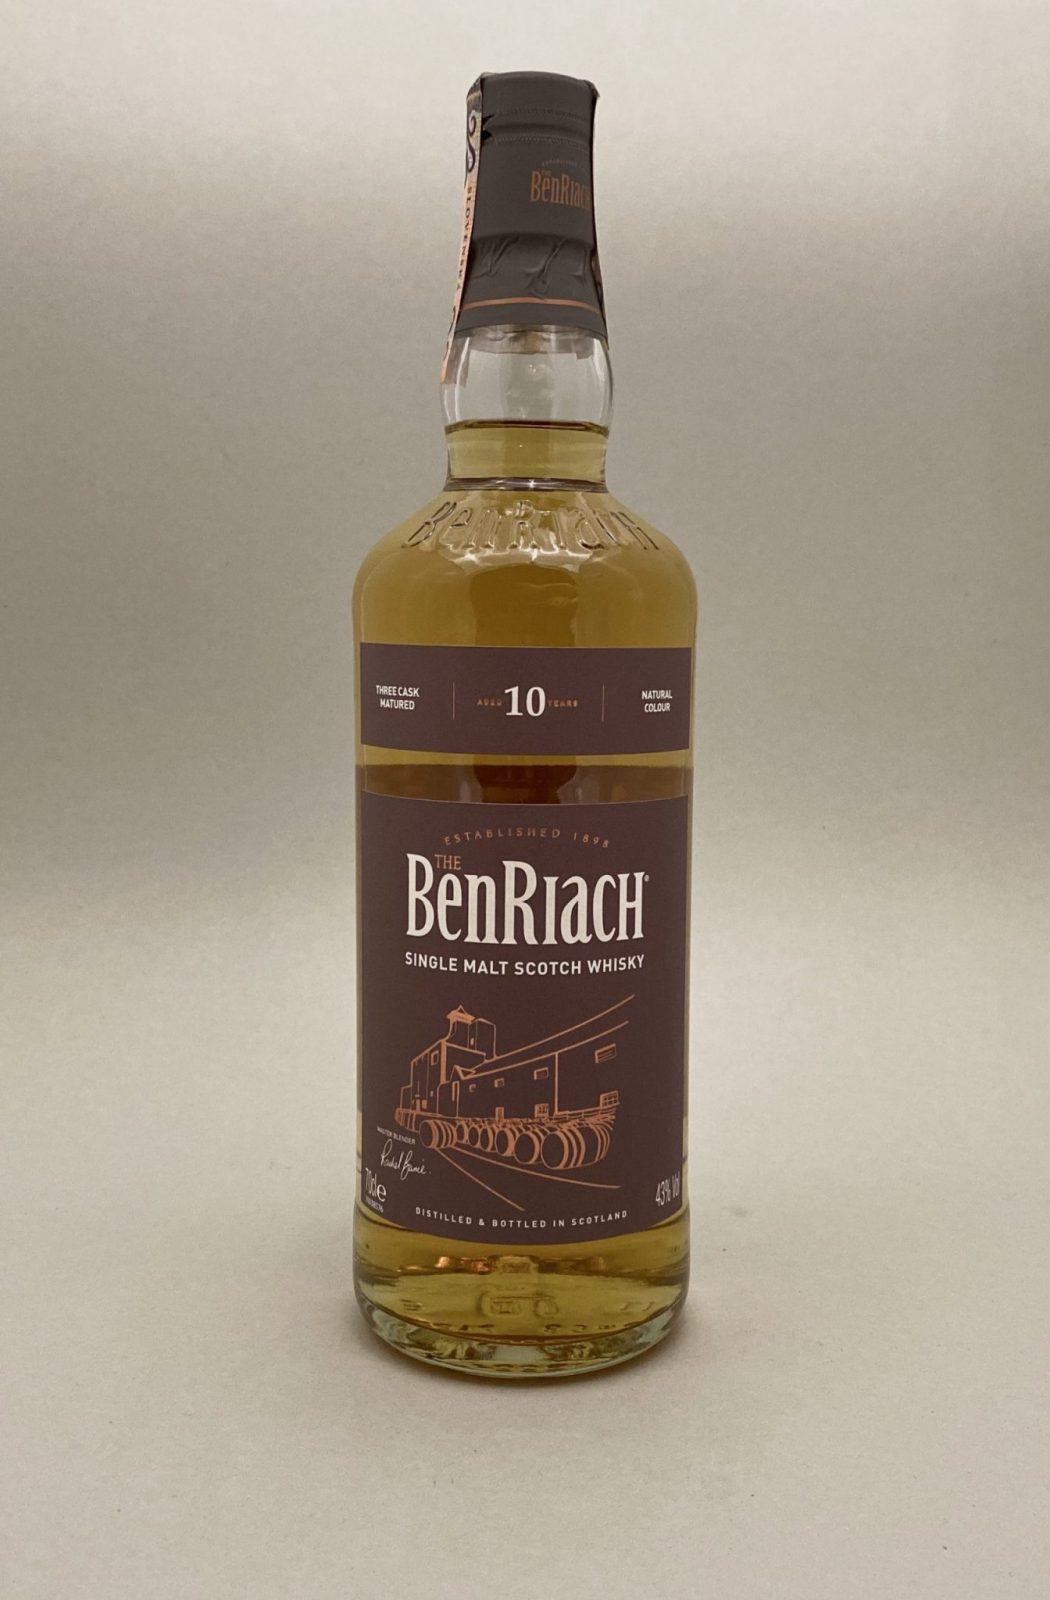 BenRiach 10YO 43%, Bottleshop Sunny wines slnecnice mesto, petrzalka, Škótska Whisky, rozvoz alkoholu, eshop